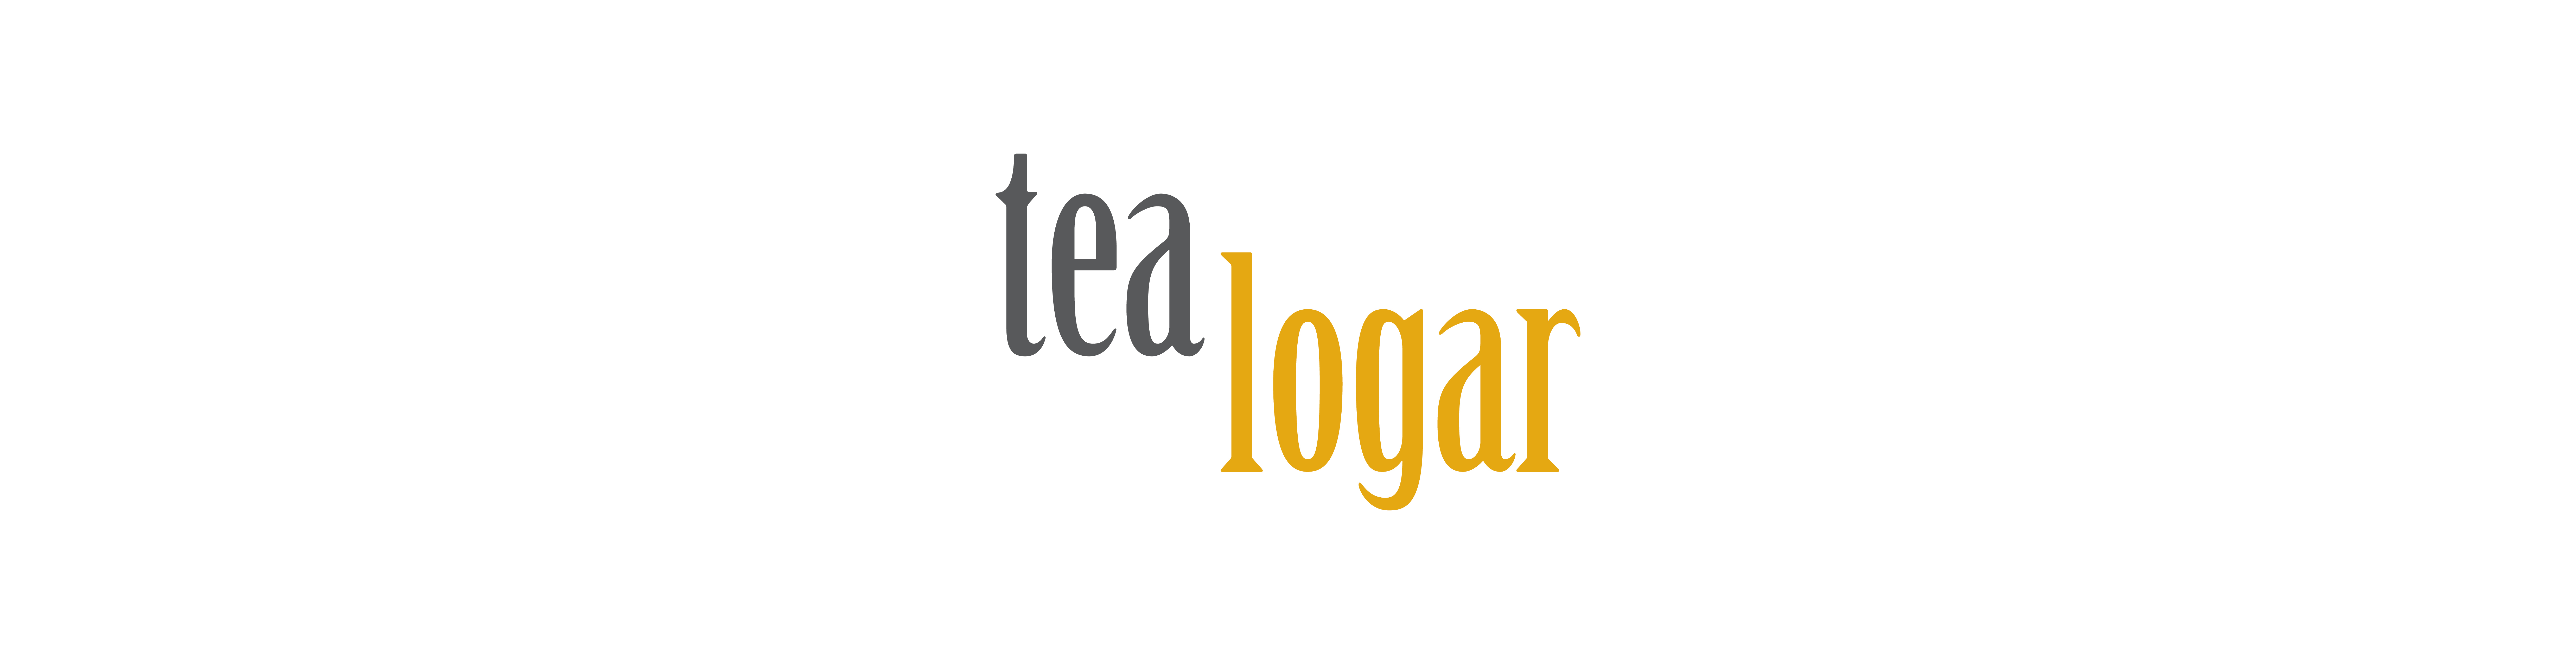 Tea Logar